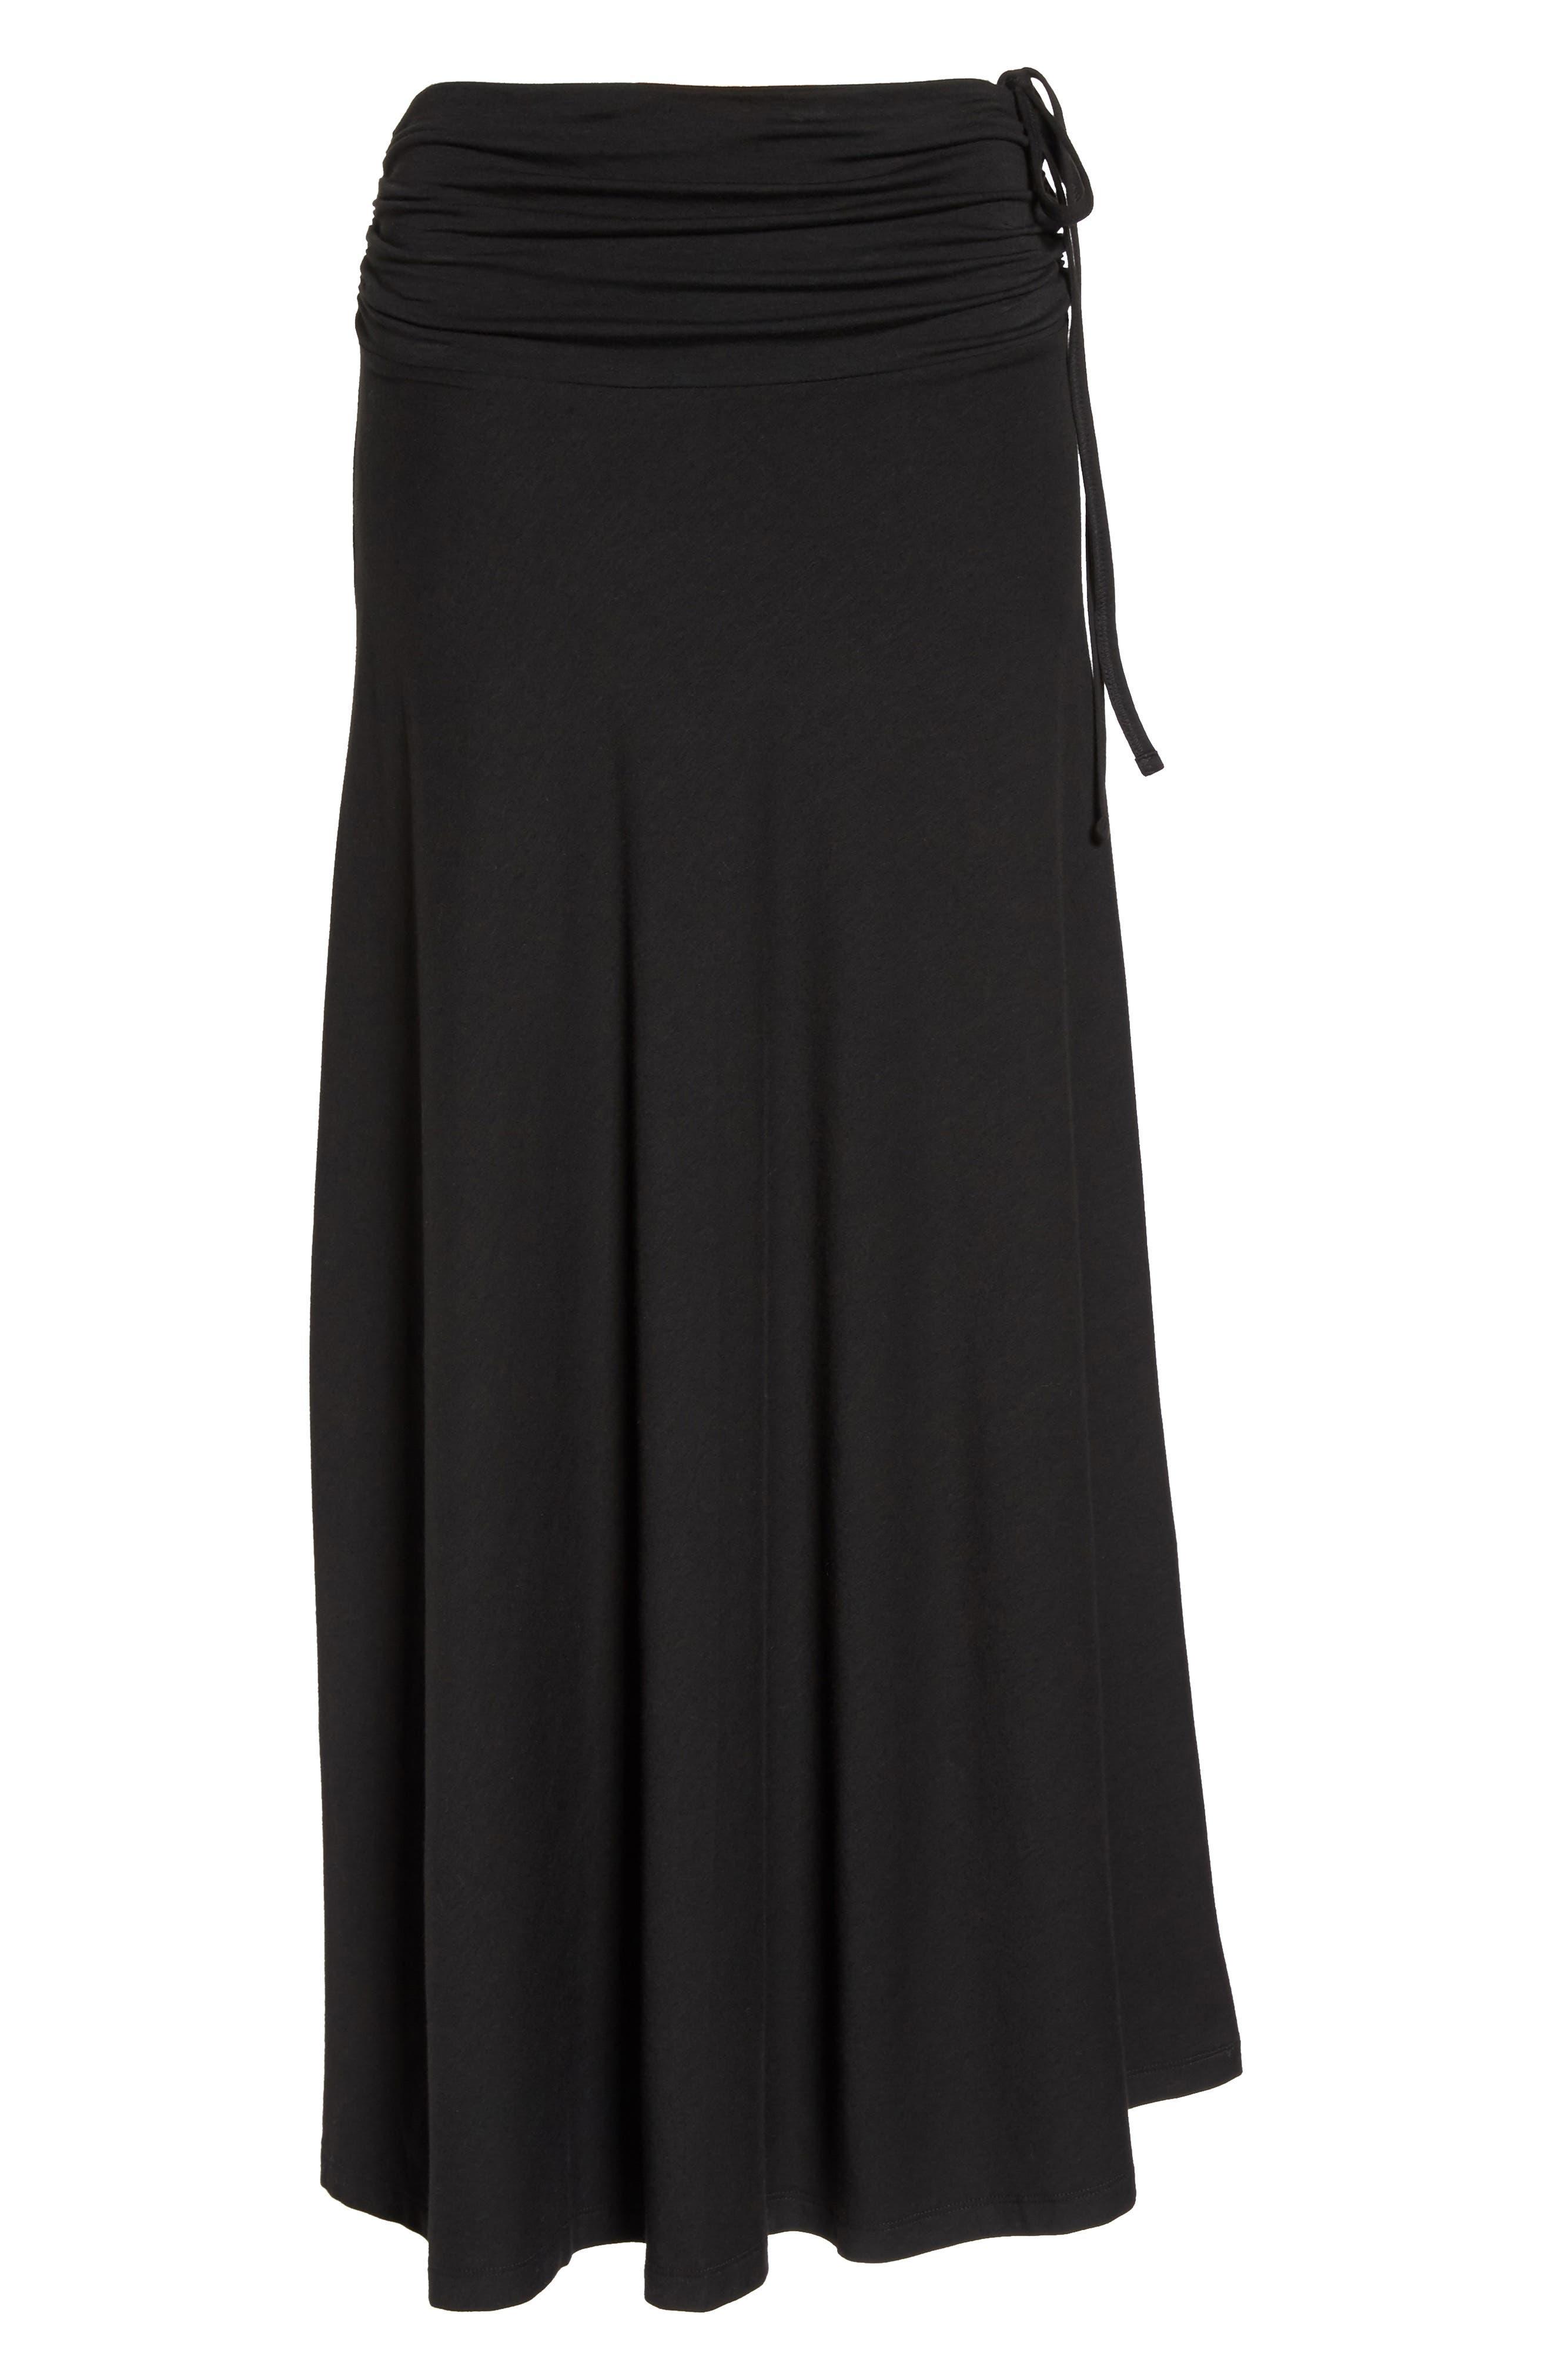 Kamala Maxi Skirt,                             Alternate thumbnail 8, color,                             001